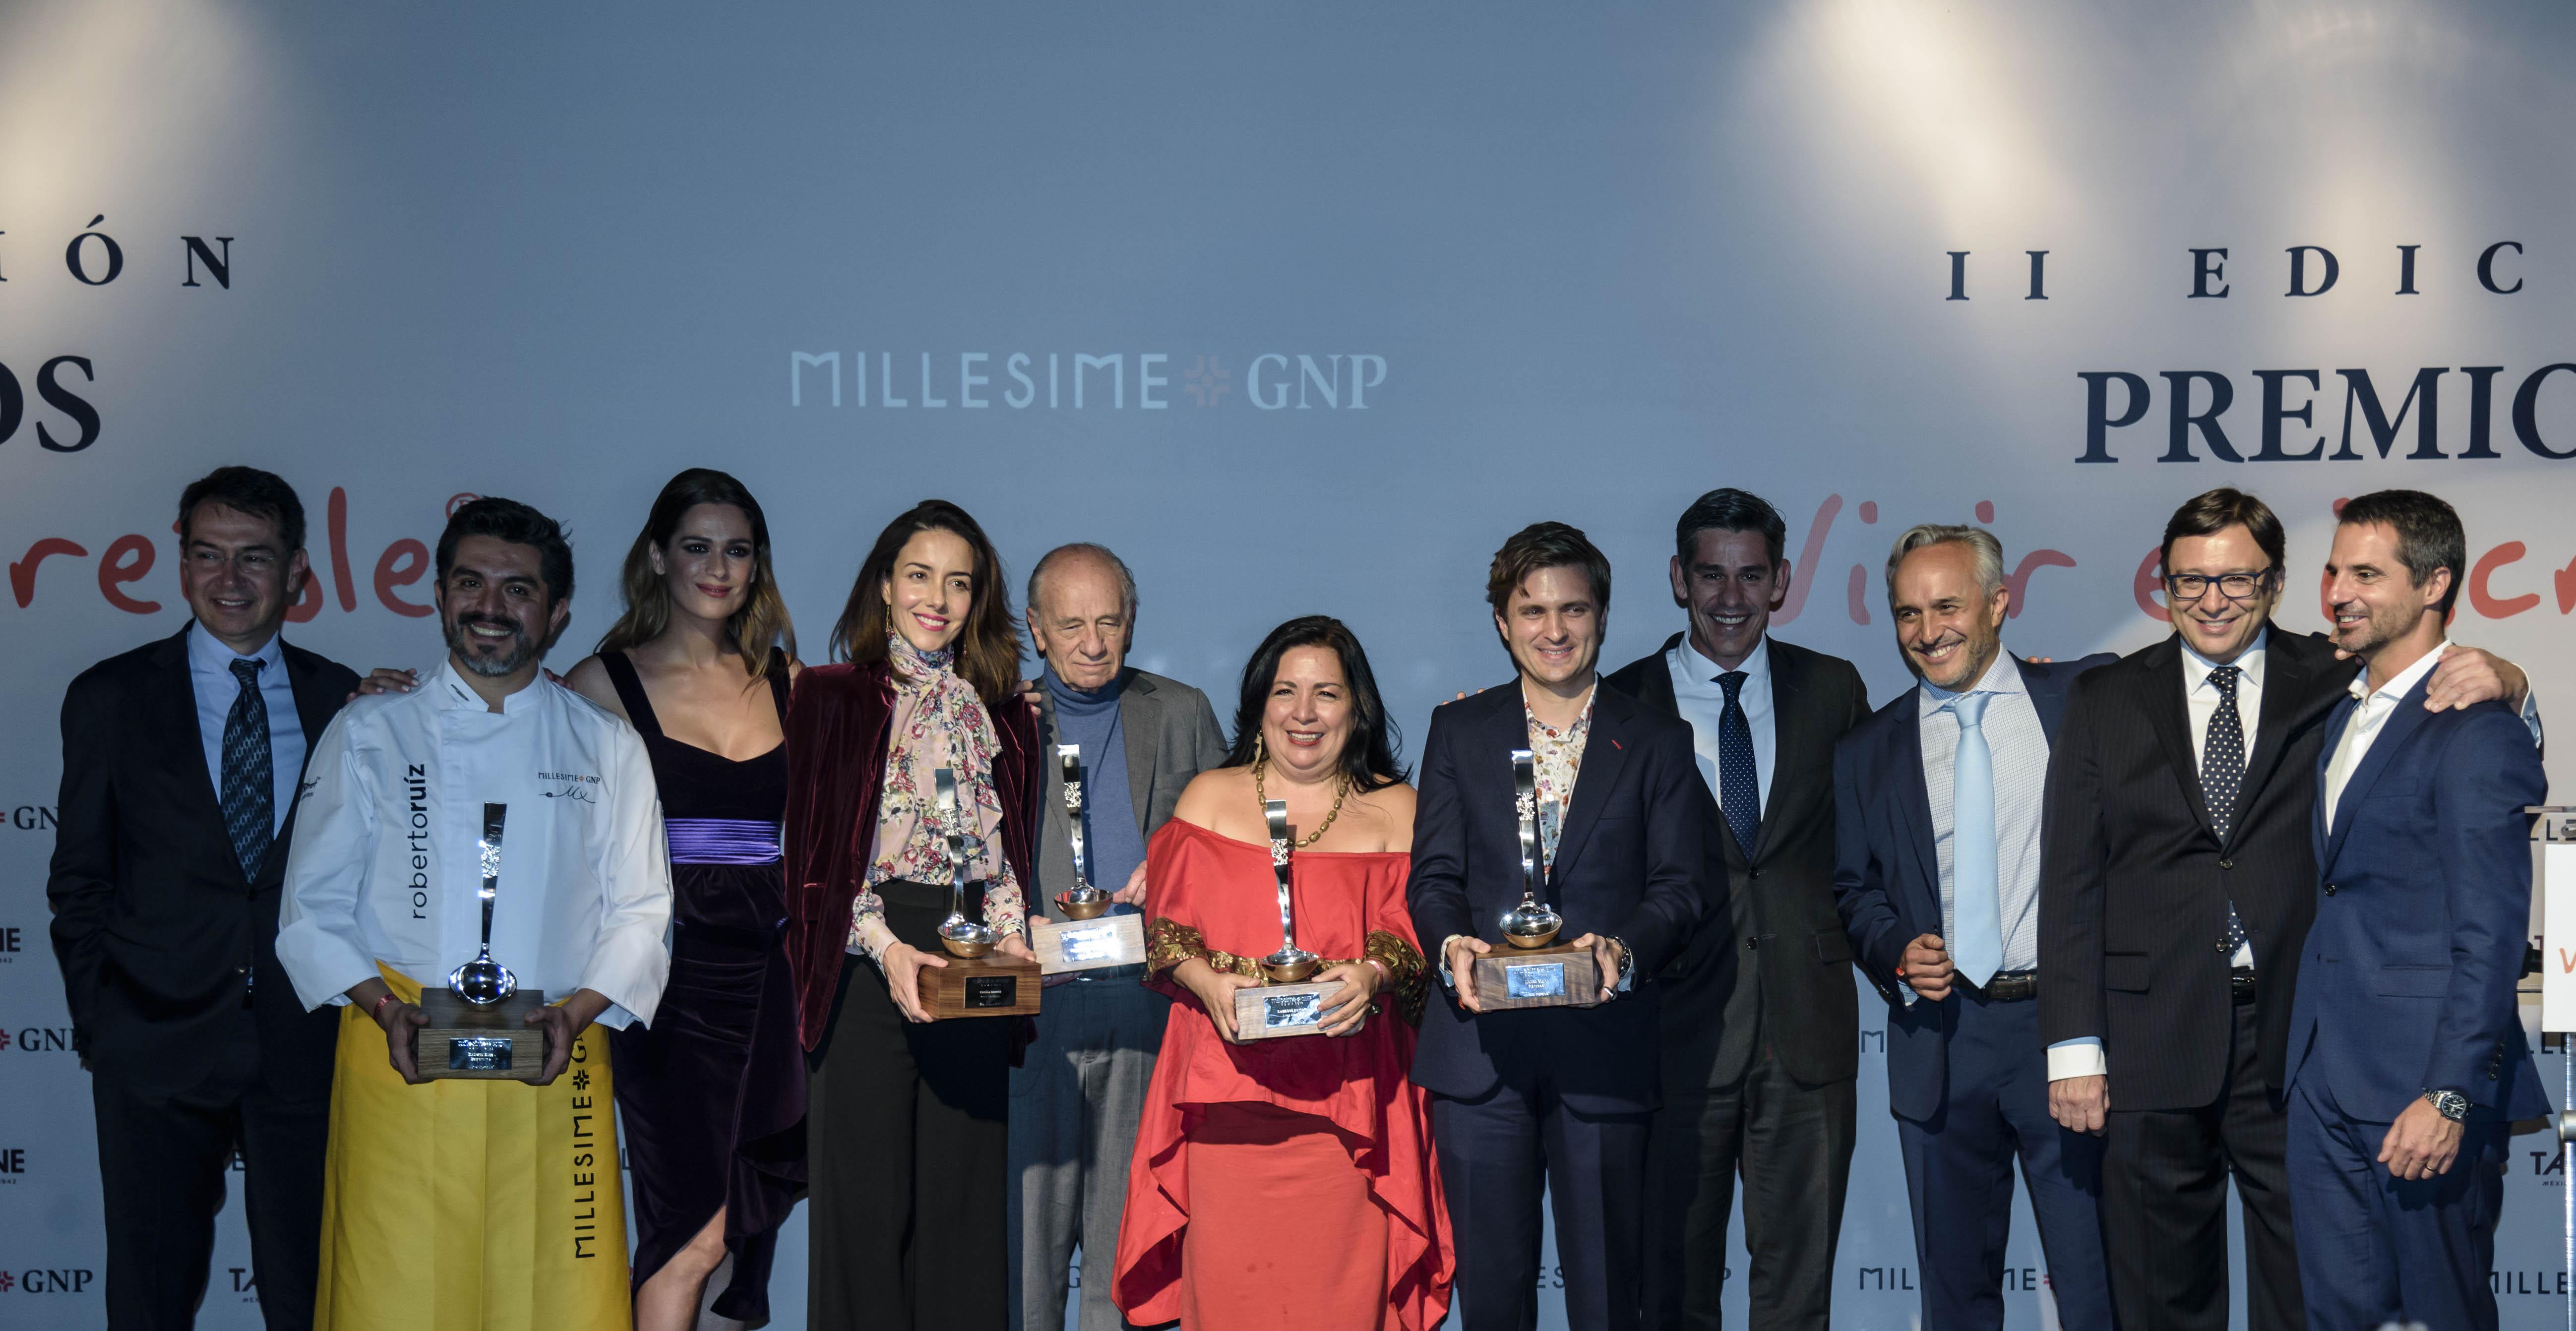 Premios VIvir es Increíble ii edición en MIllesime GNP